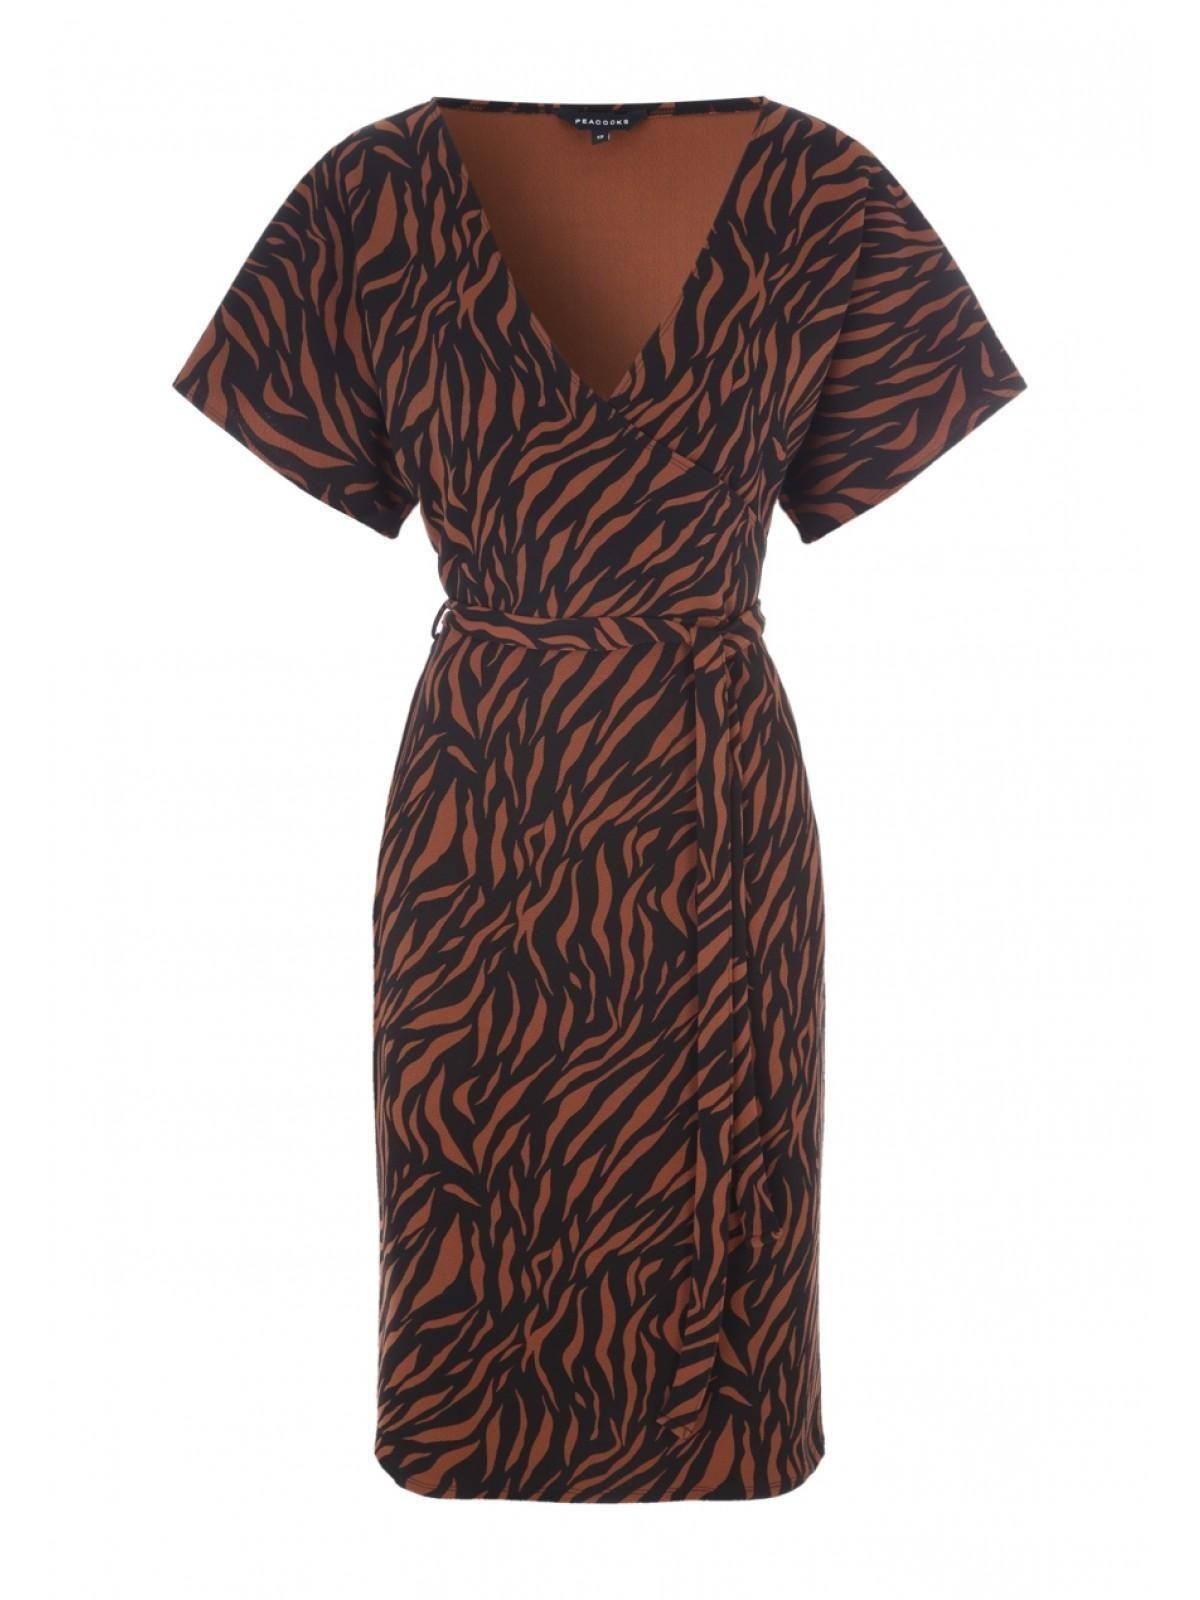 Womens Tan Zebra Print Wrap Dress Peacocks Zebra Print Wrap Dress Wrap Dress Dresses [ 1600 x 1200 Pixel ]